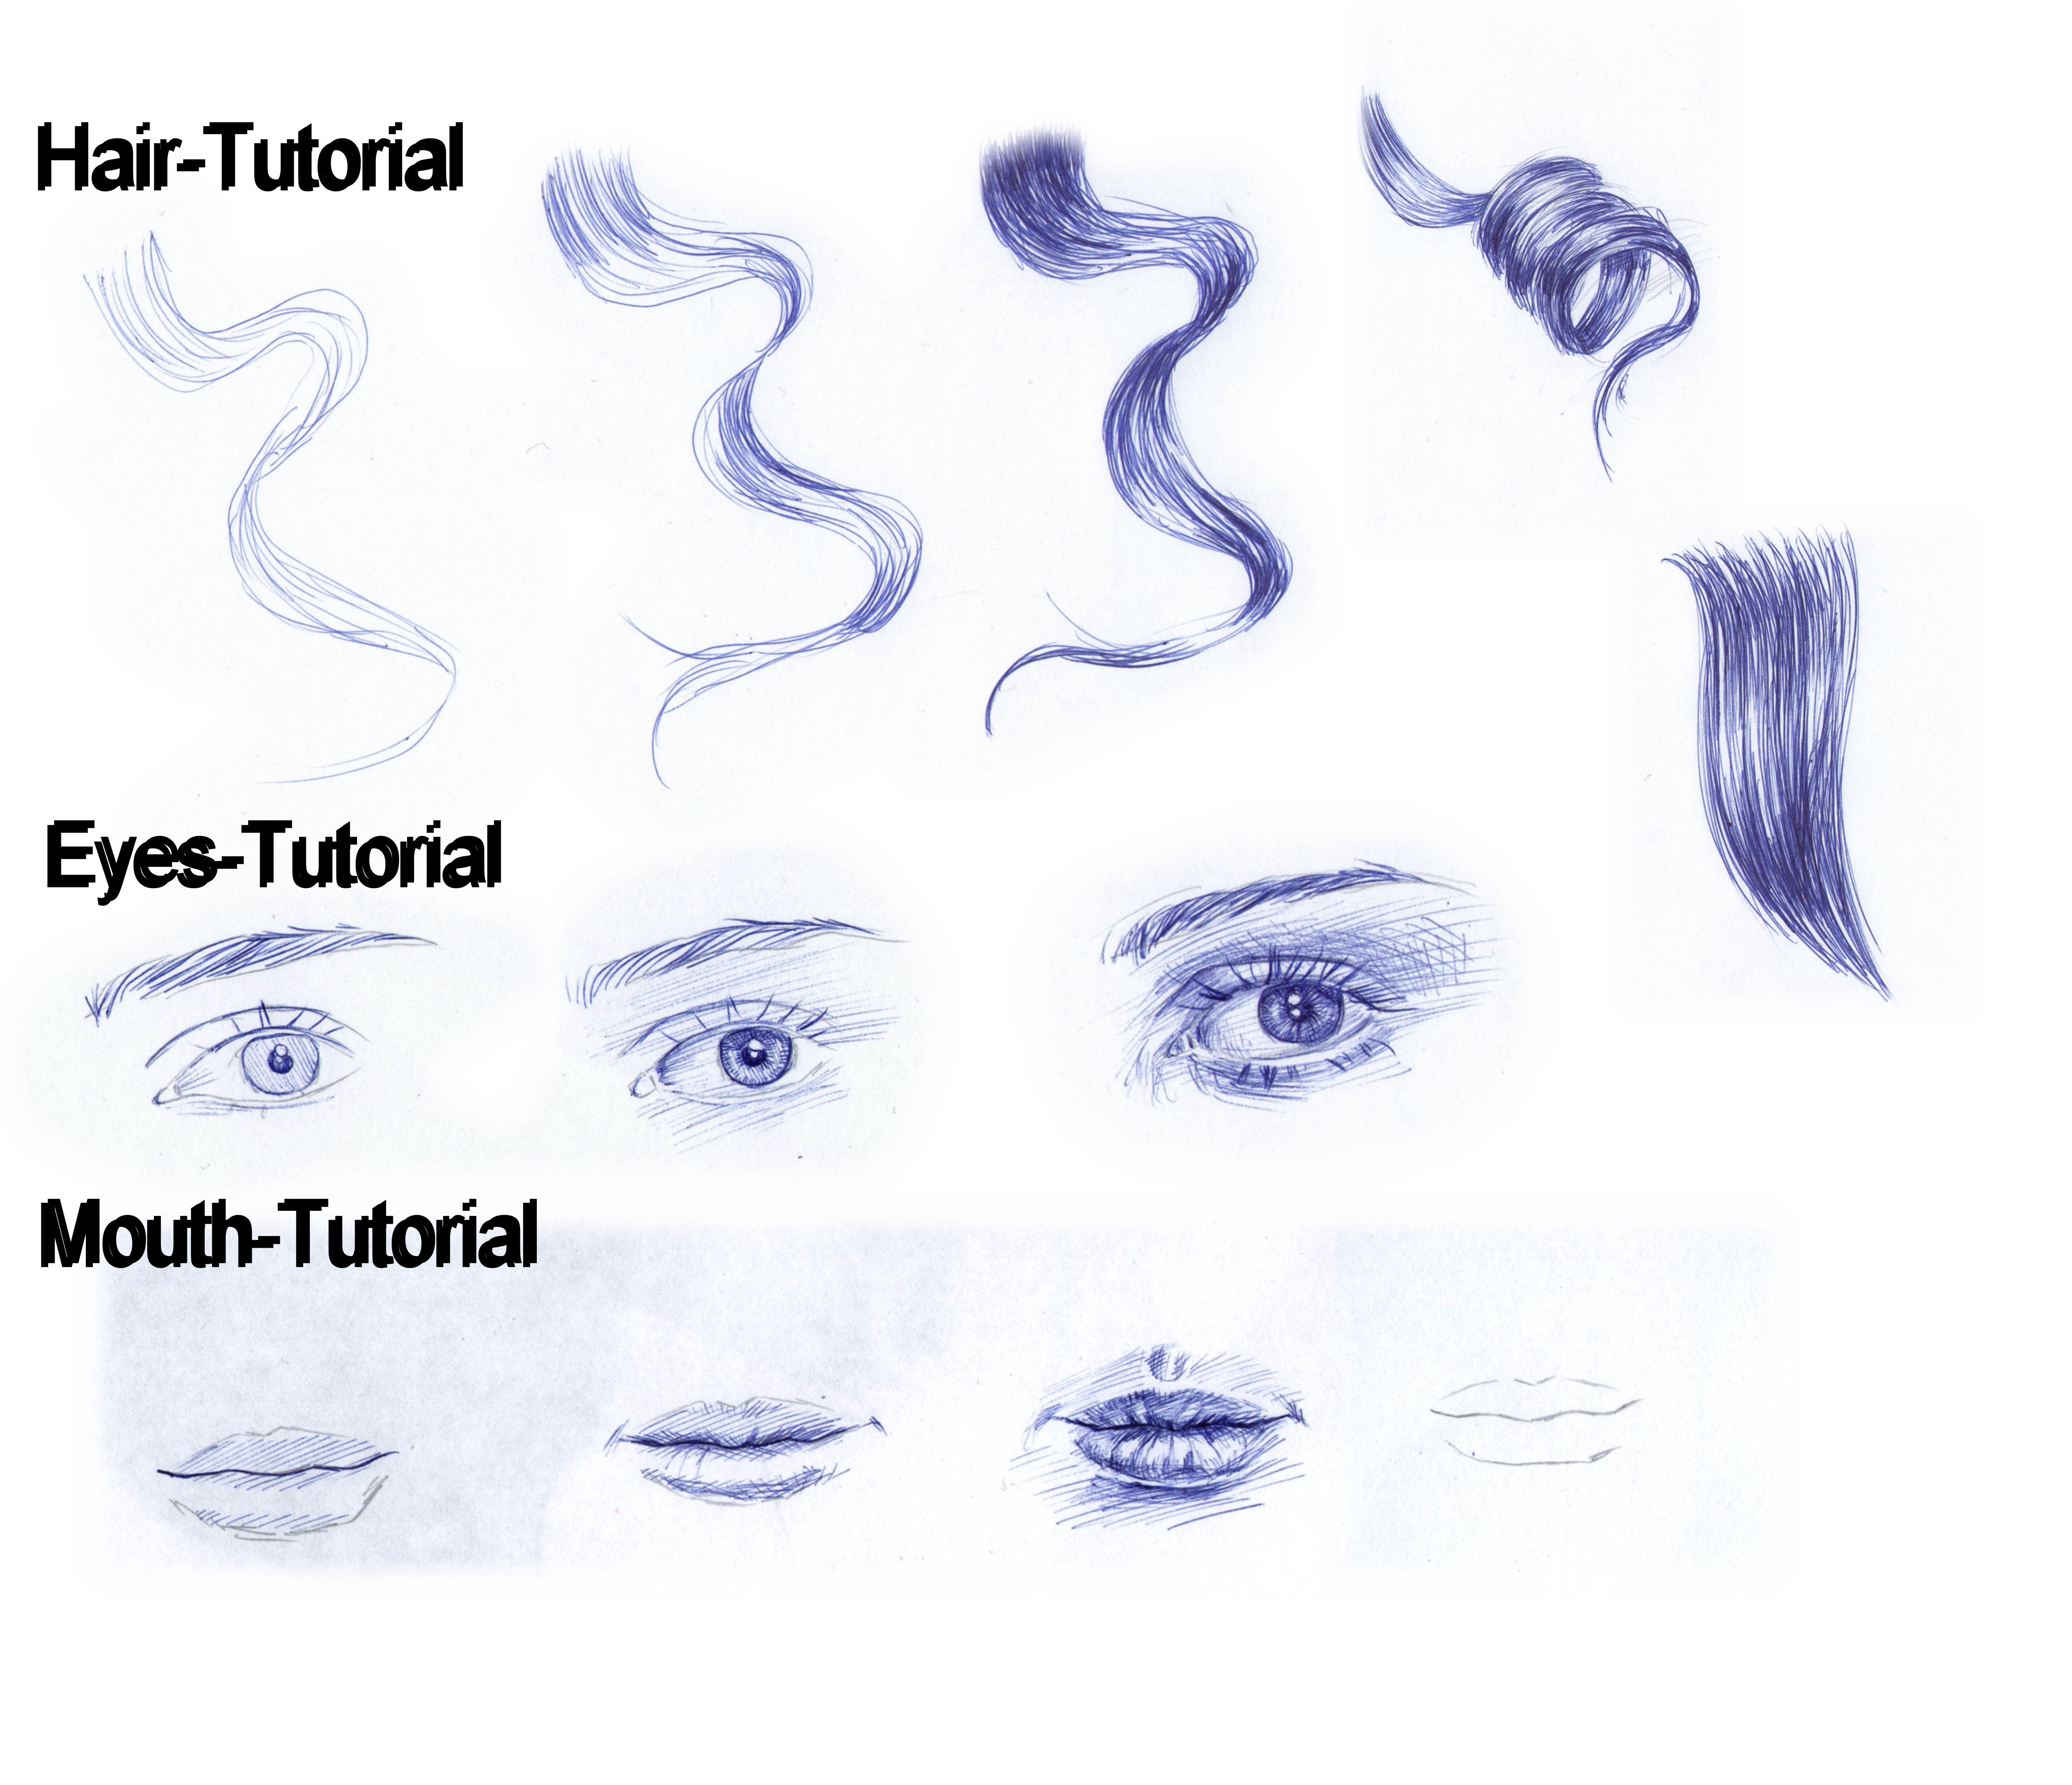 Tutorial ballpoint pen eyes mouth curly hair by angelinabenedetti tutorial ballpoint pen eyes mouth curly hair by angelinabenedetti ccuart Gallery